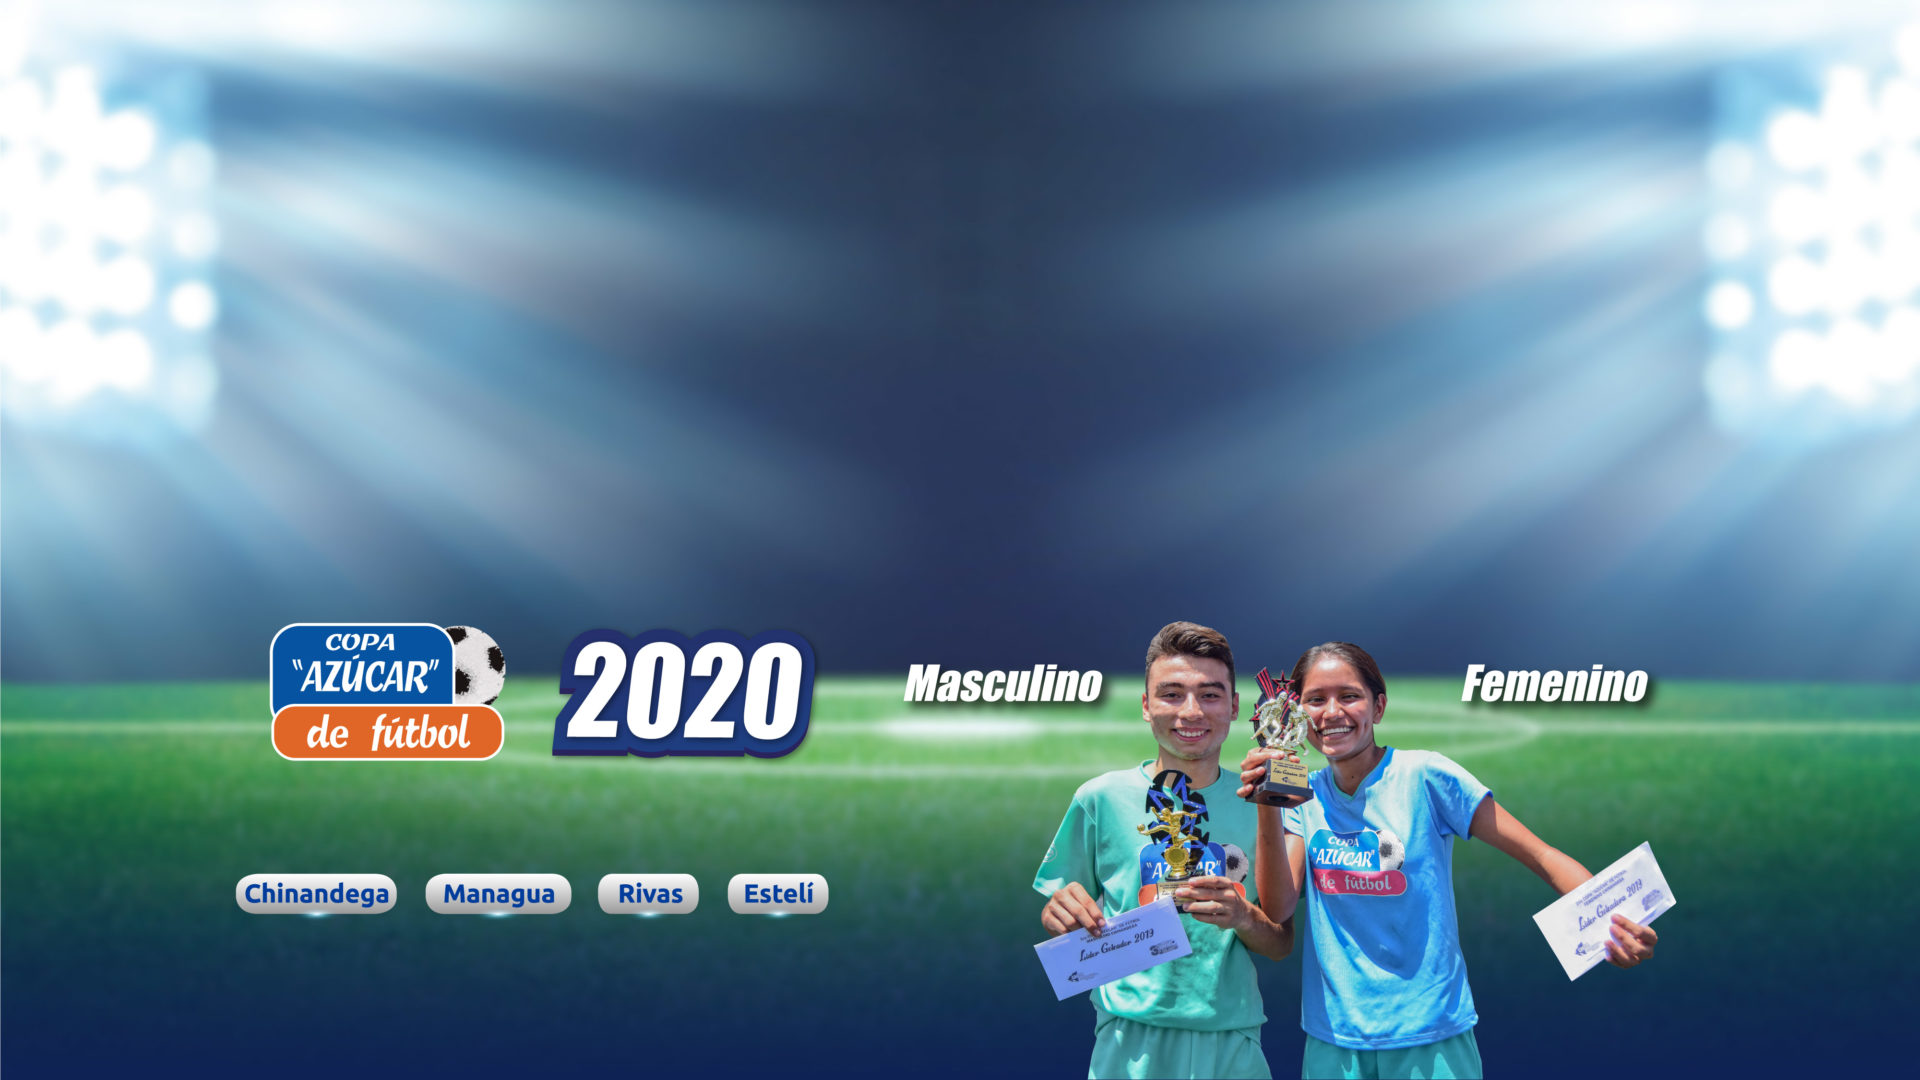 CONVOCATORIA_2020-WEB-01